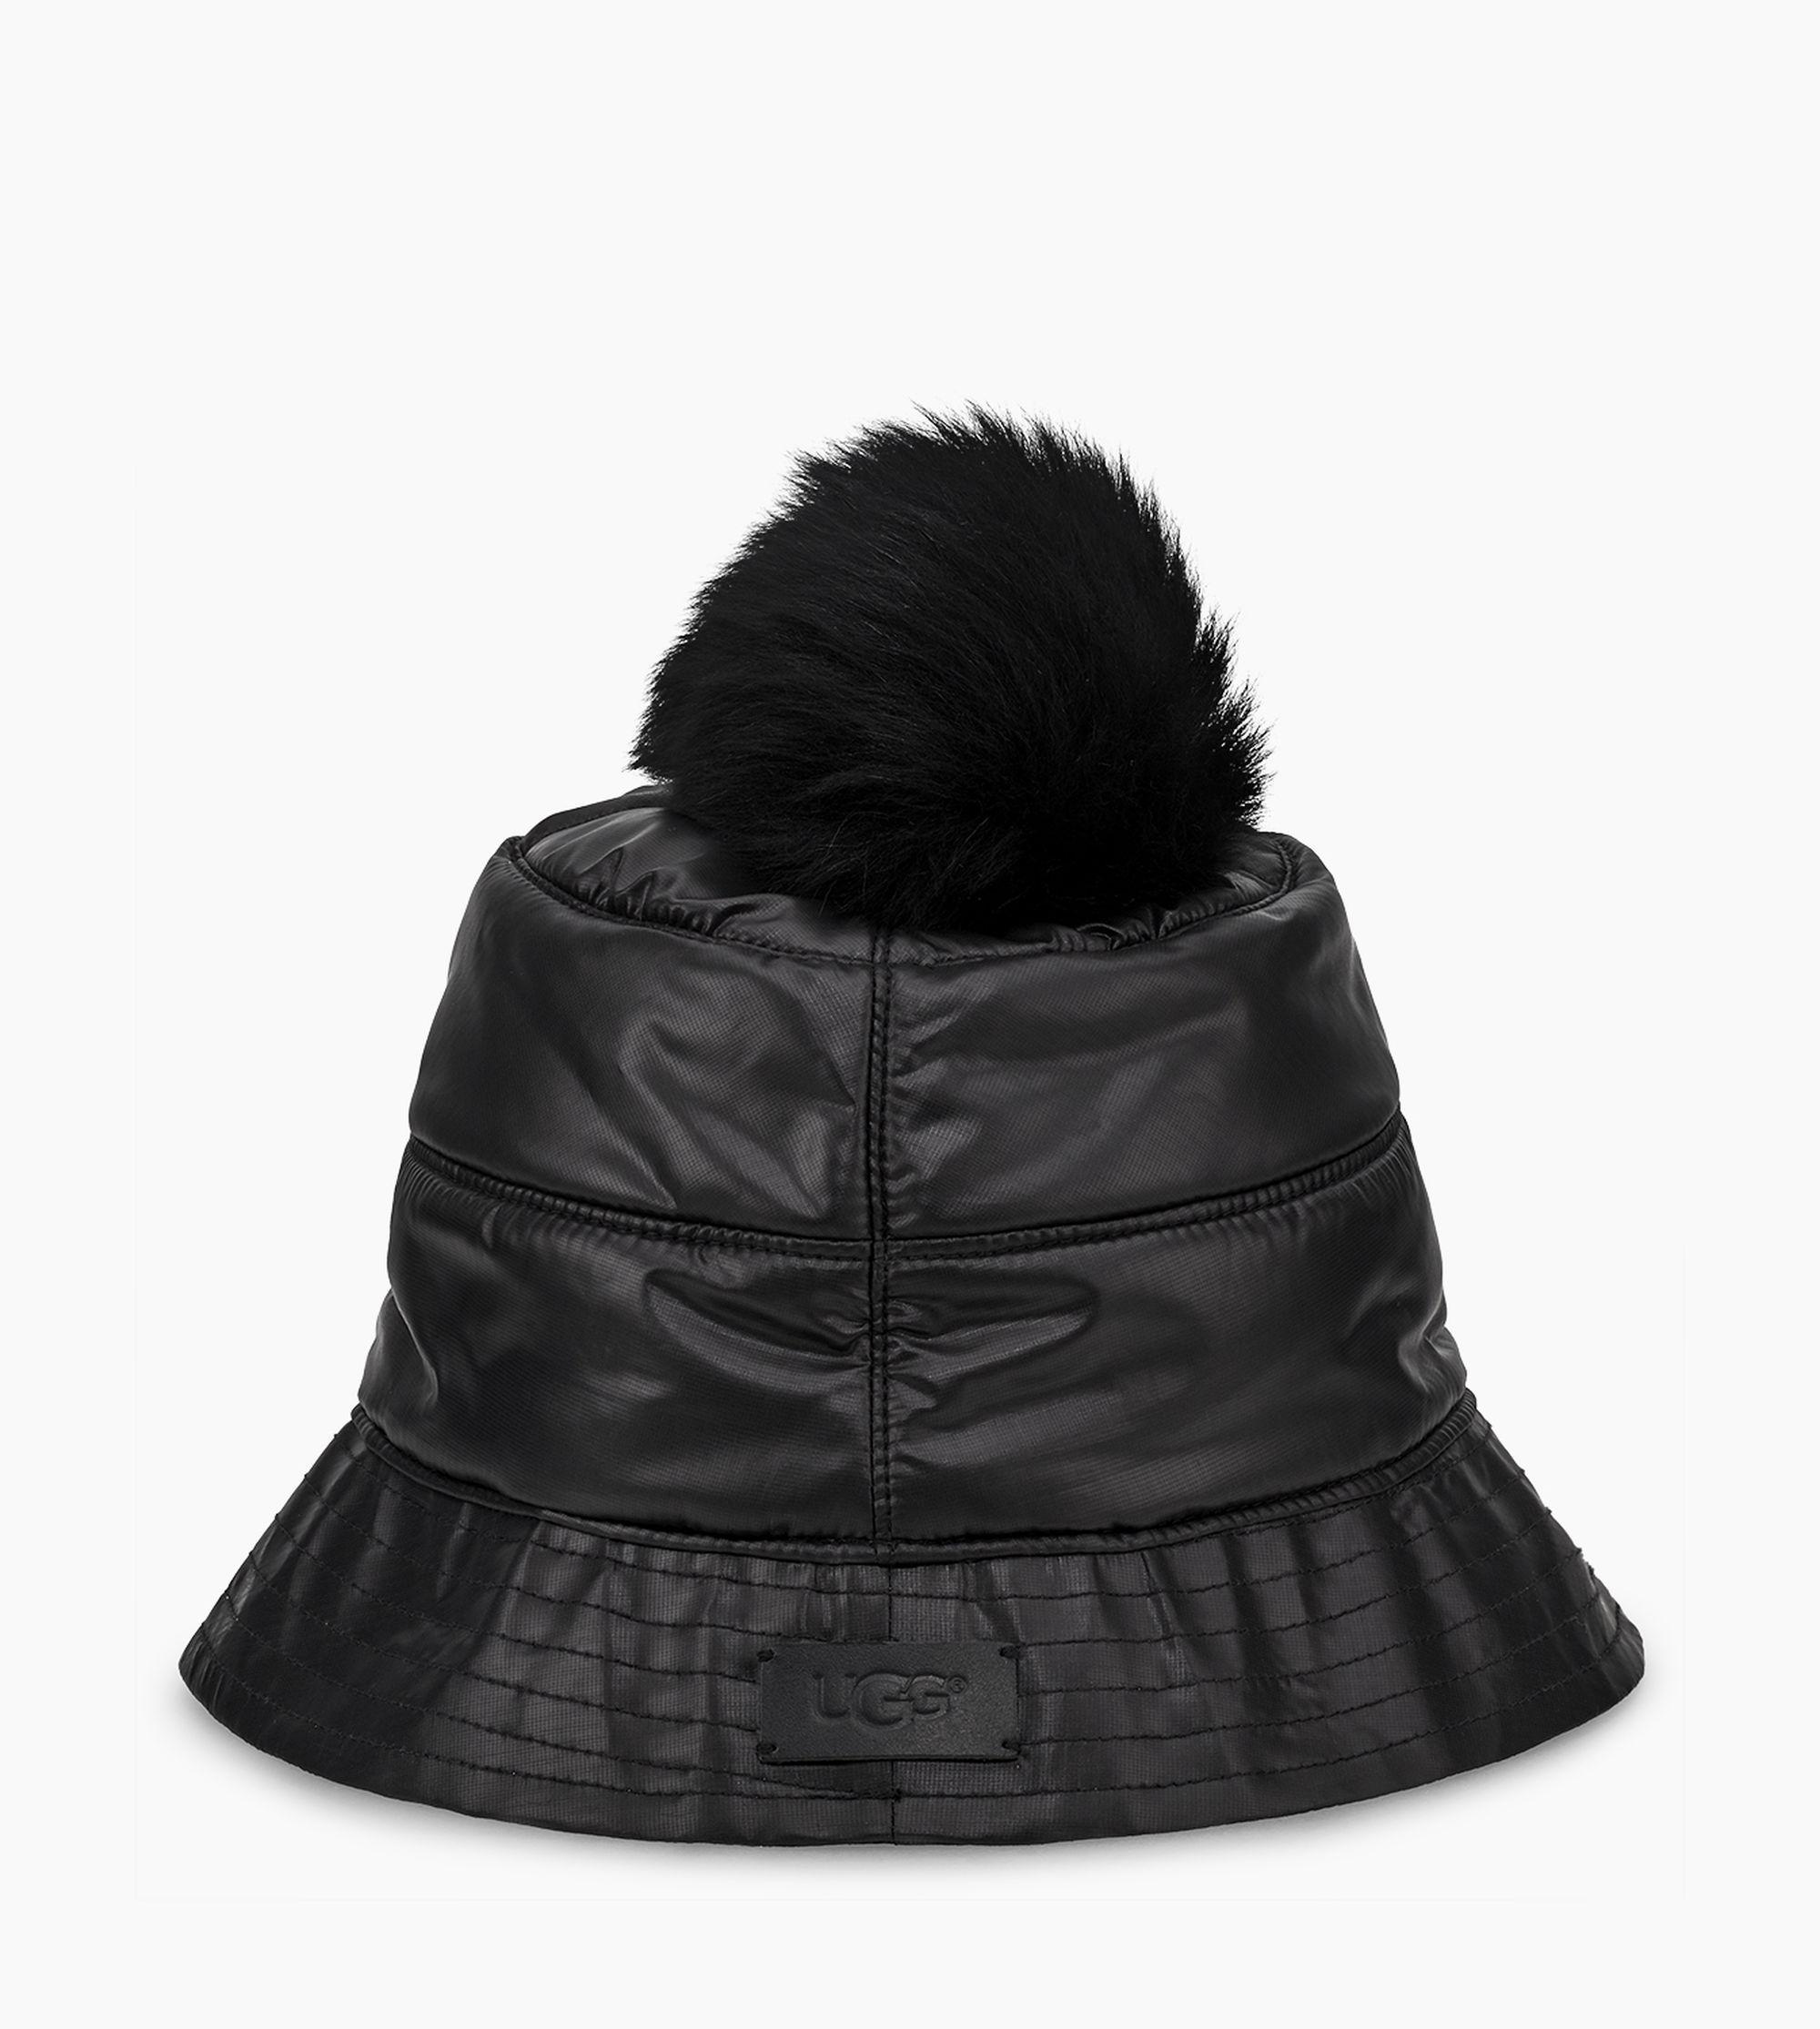 Lyst - UGG All Weather Bucket Hat W  Pom All Weather Bucket Hat W ... d6e878ff1036